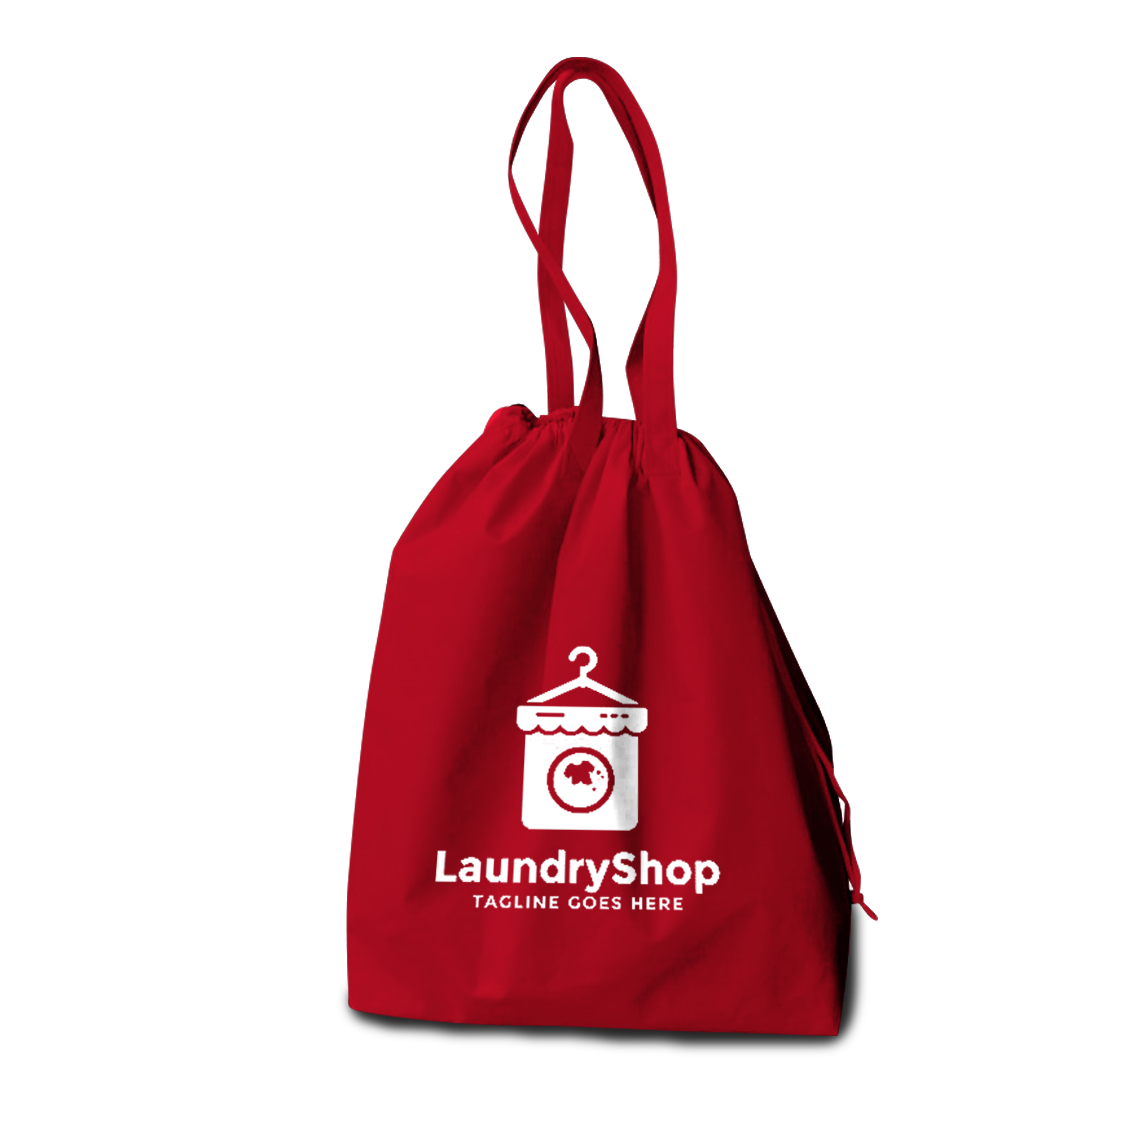 Tas Spunbond Laundry 161 tas laundry